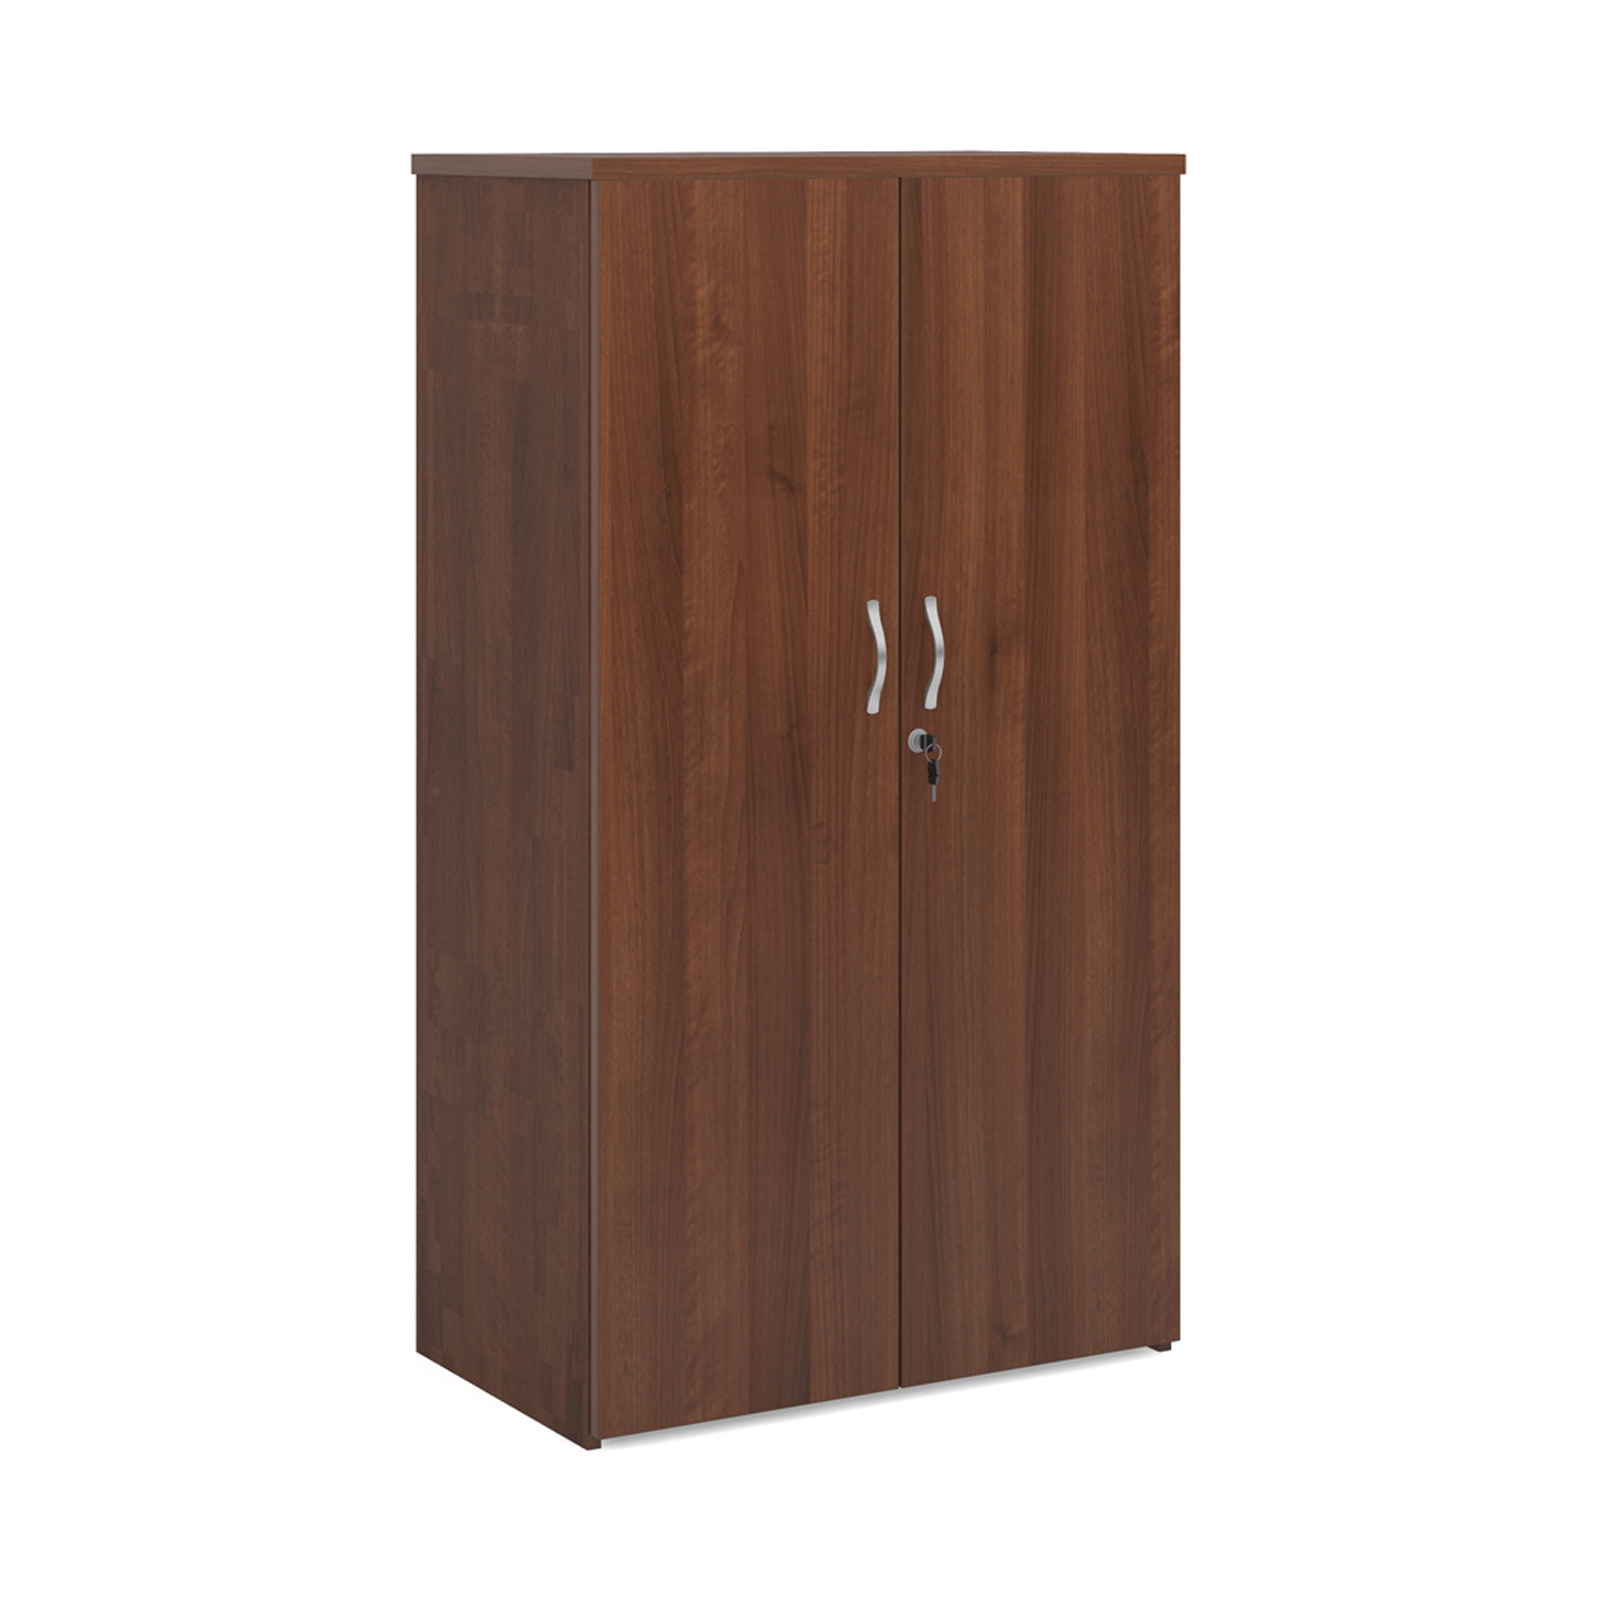 Over 1200mm High Universal double door cupboard 1440mm high with 3 shelves - walnut